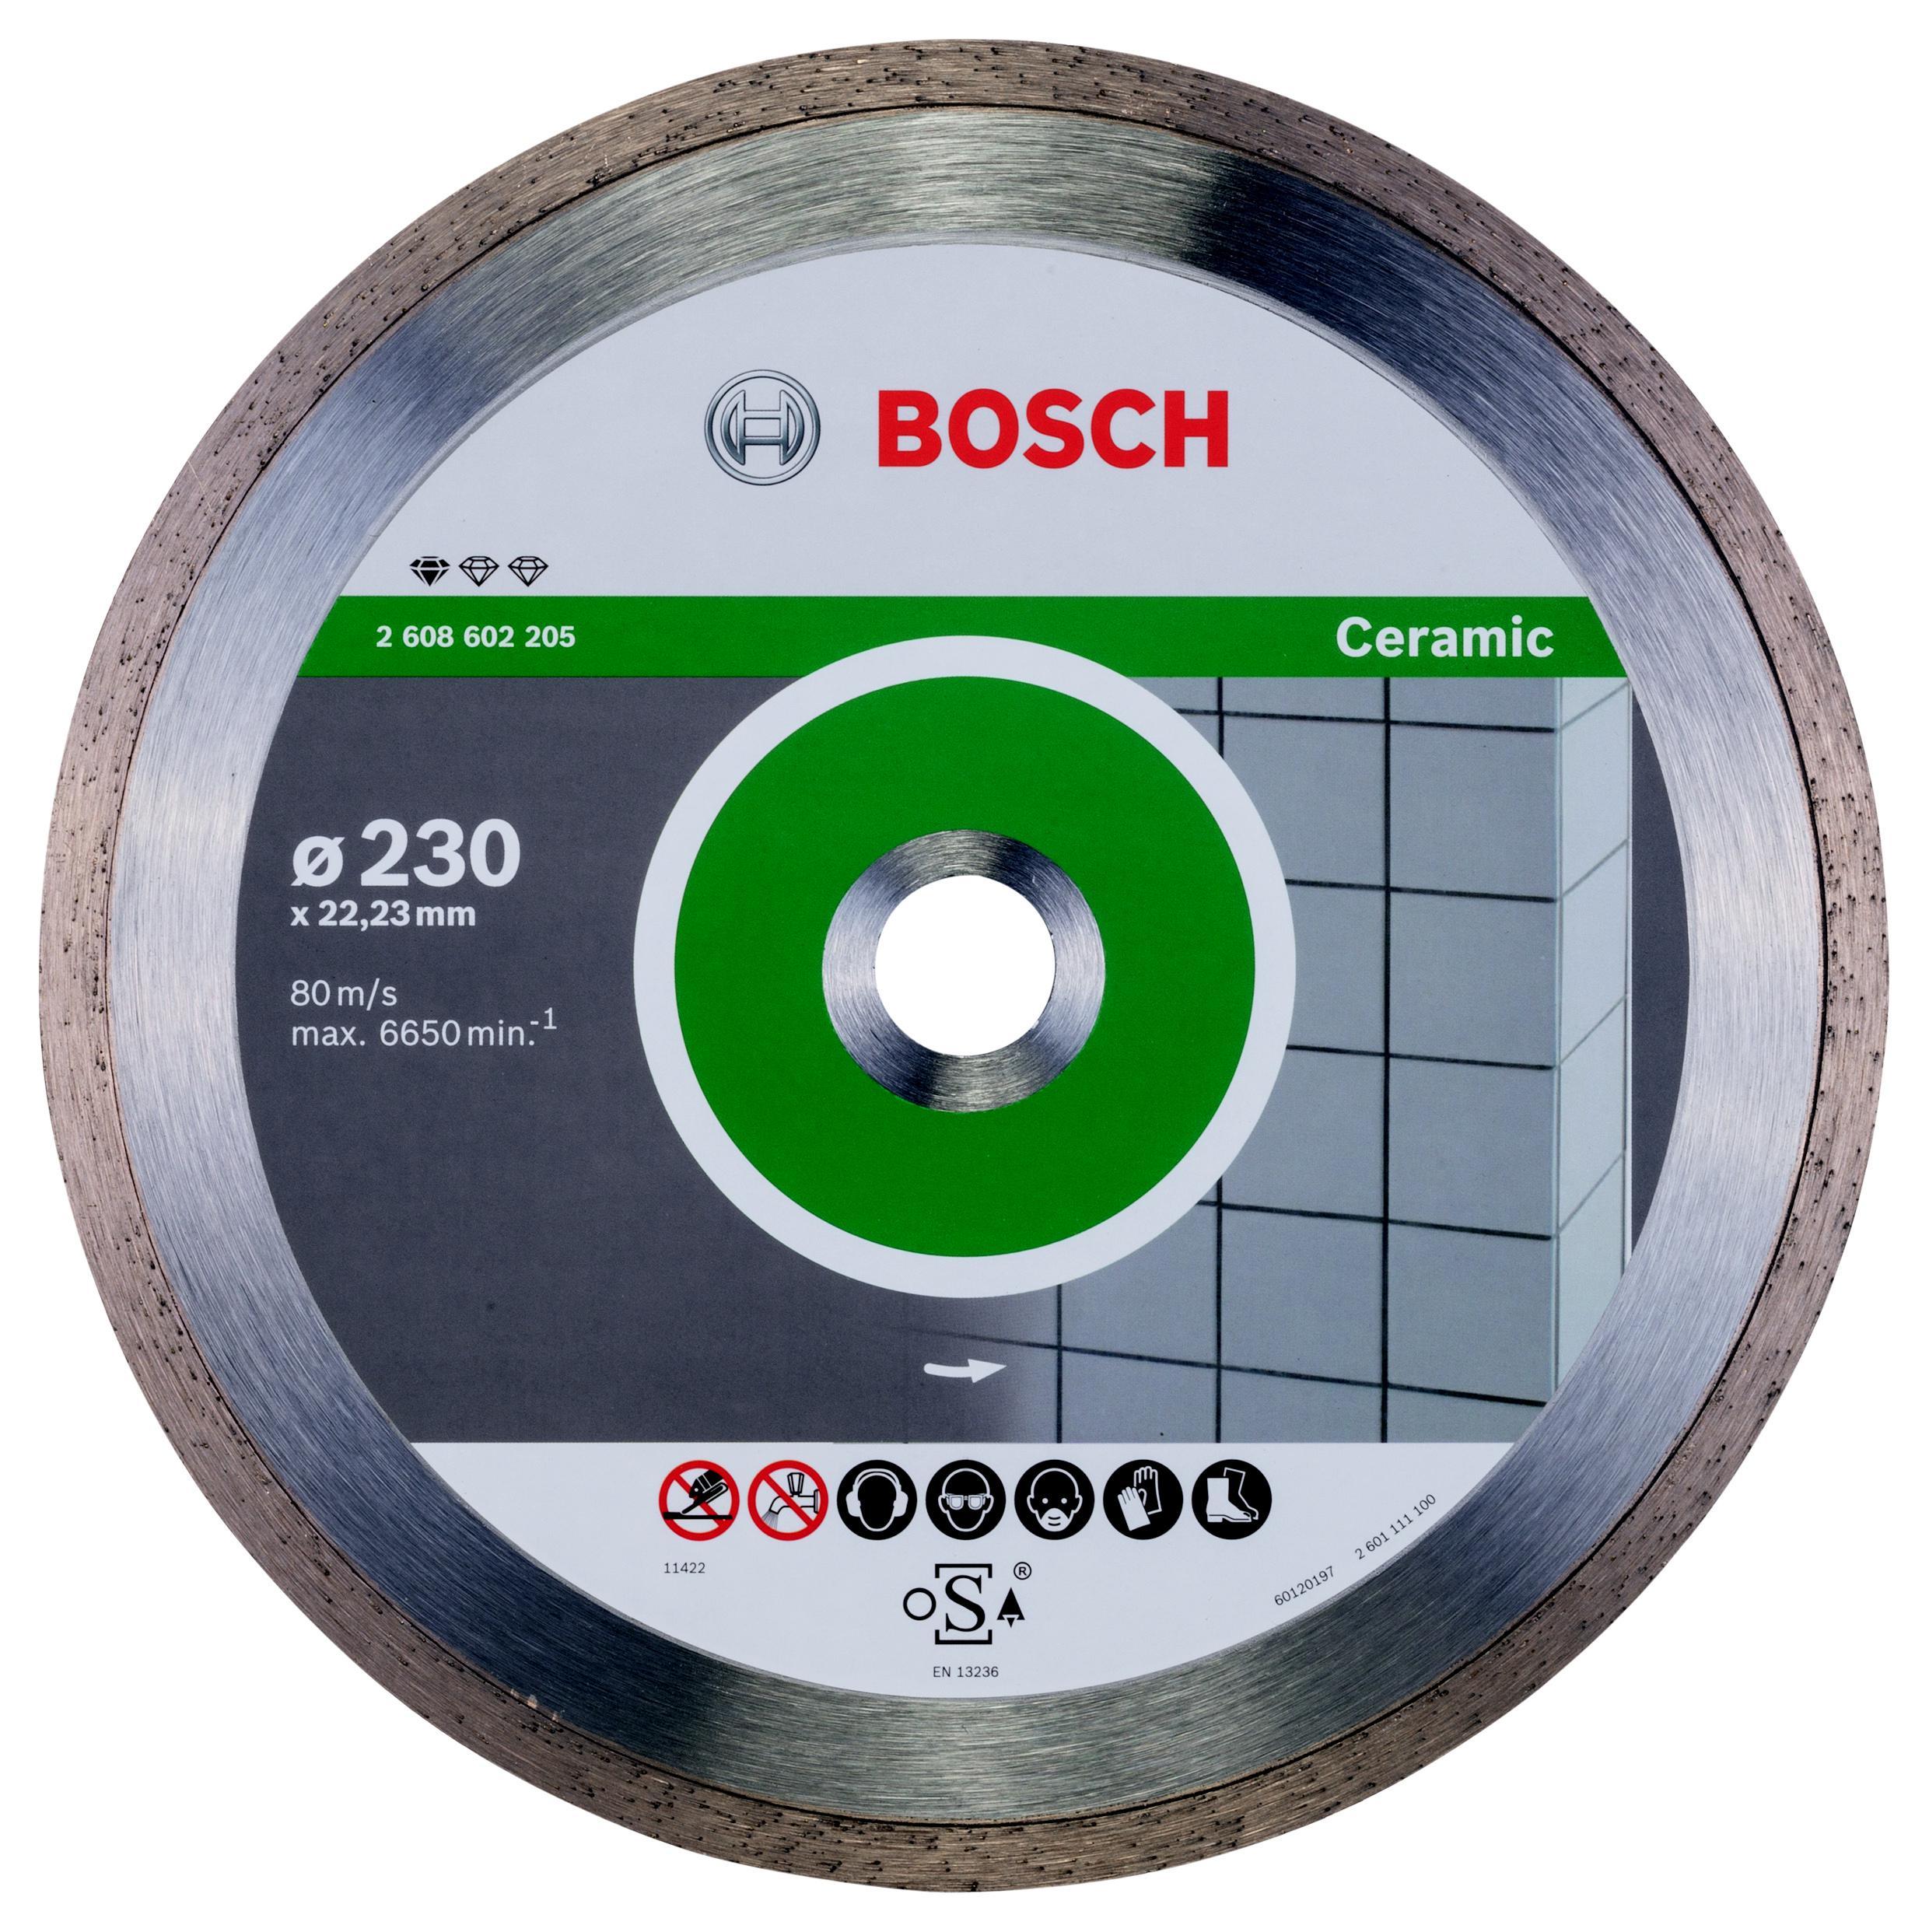 Круг алмазный Bosch Standard for ceramic 230x22 корона (сплошной)(2.608.602.205) алмазный диск bosch standard for ceramic 115 22 23 2608602201